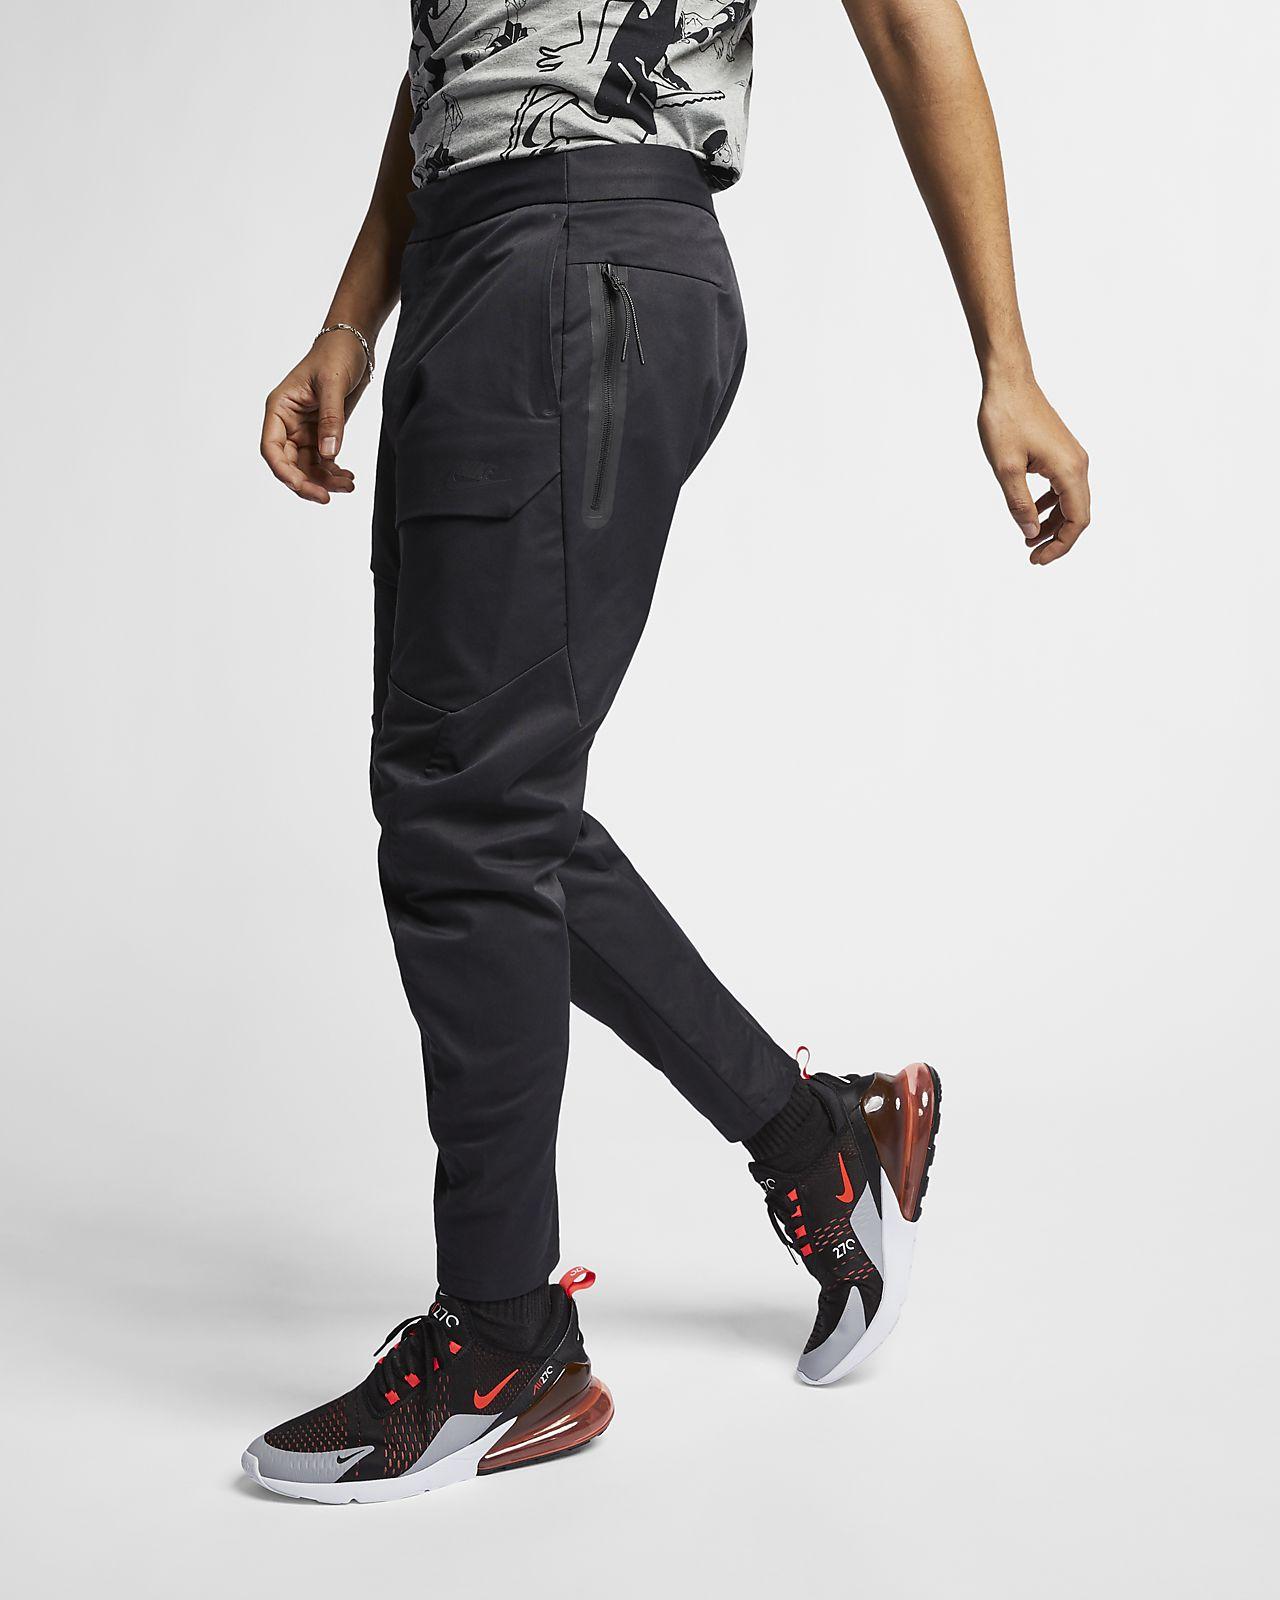 70a177064c0 Nike Sportswear Tech Pack Geweven cargobroek voor heren. Nike.com BE